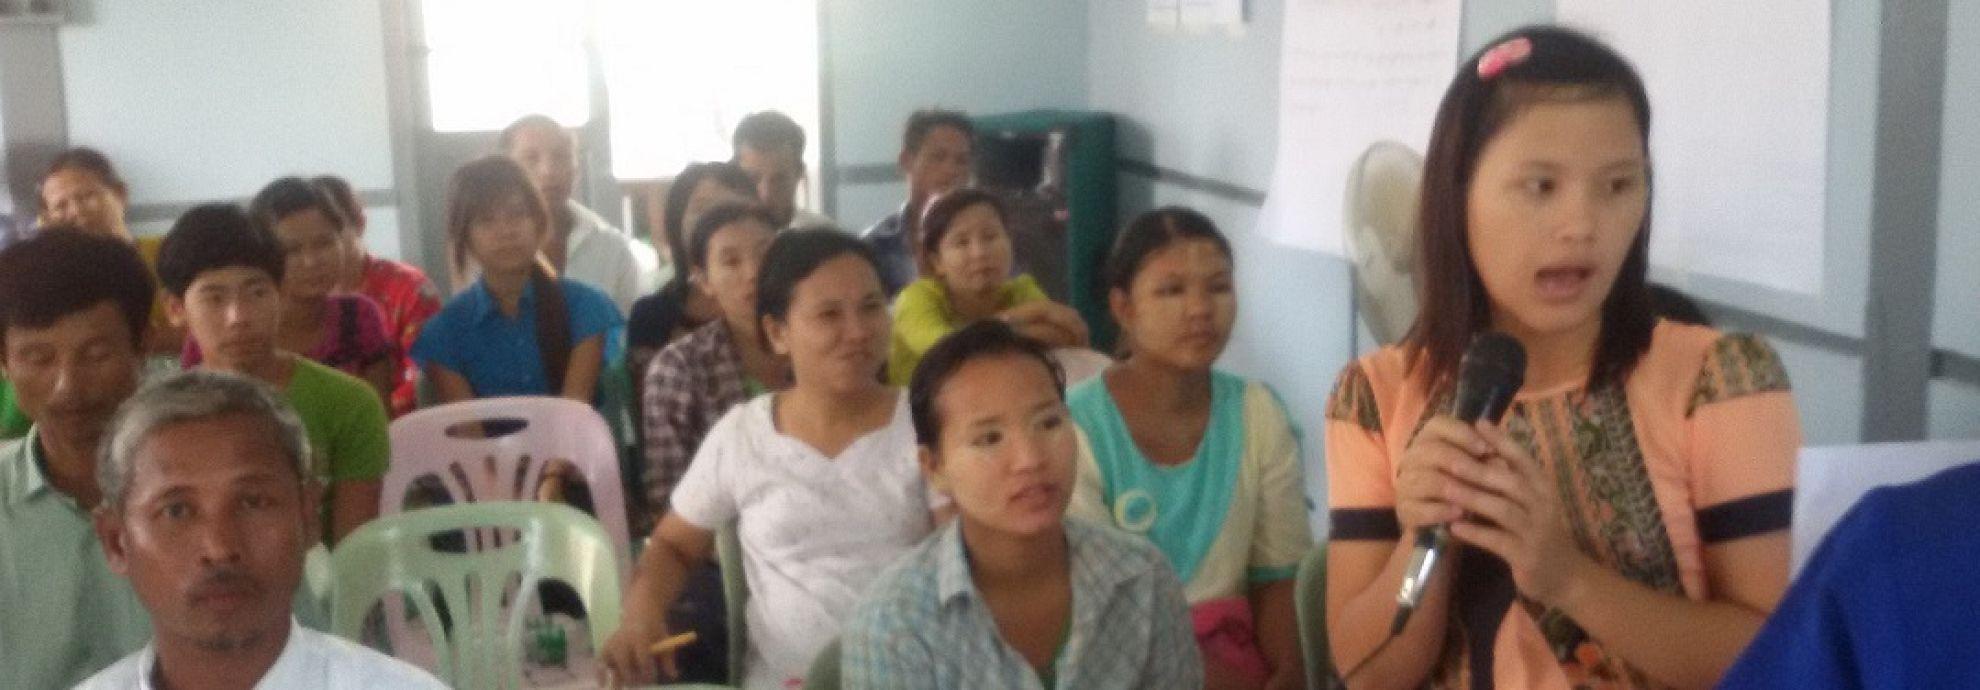 Latest News Myanmar community members spearhead novel approach to eliminate dengue